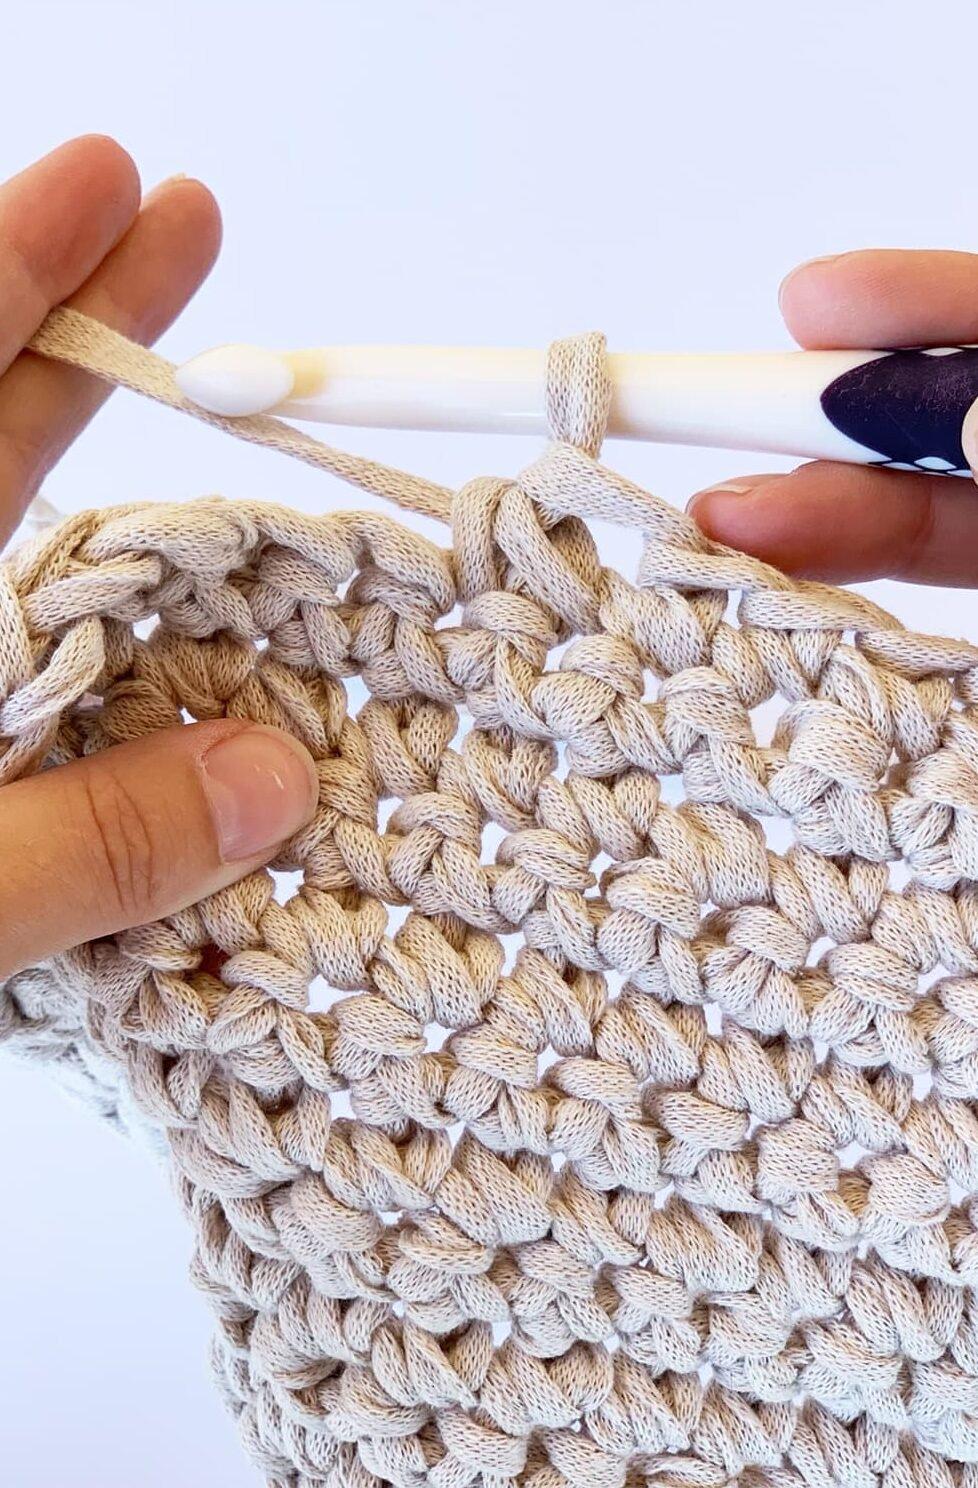 single crochet decrease with hook